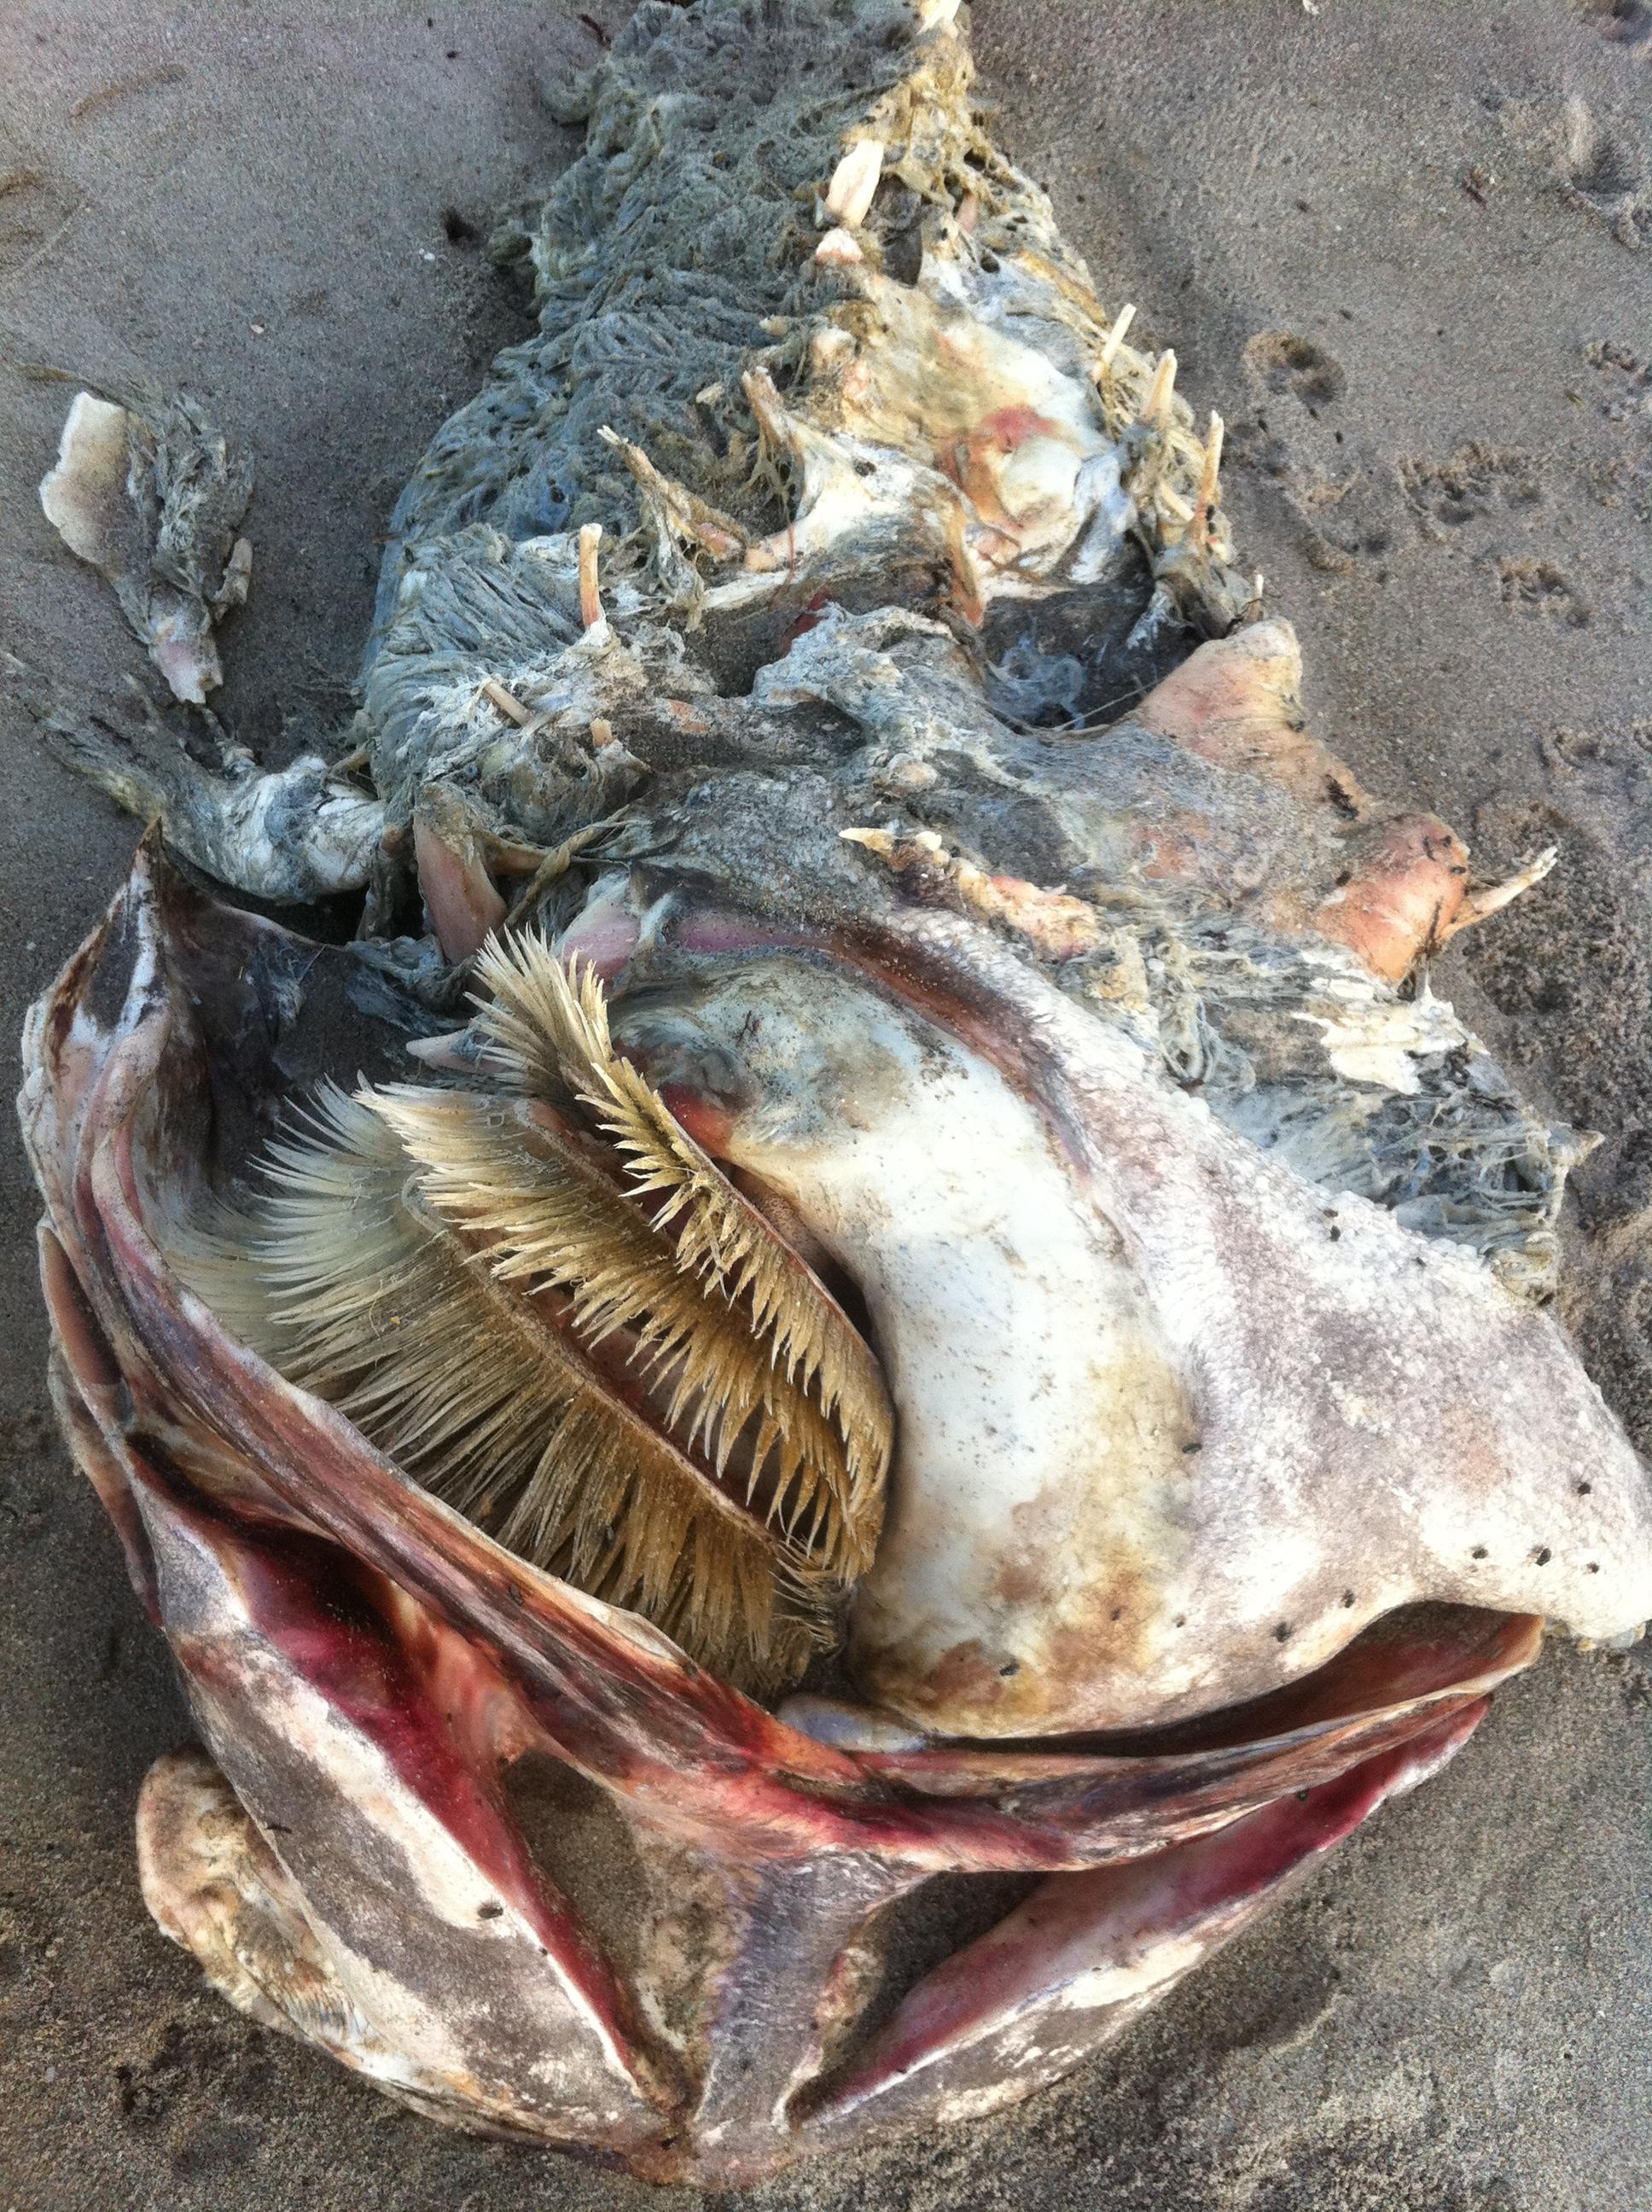 Goliath Grouper In St Lucie River Jacqui Thurlow Lippisch